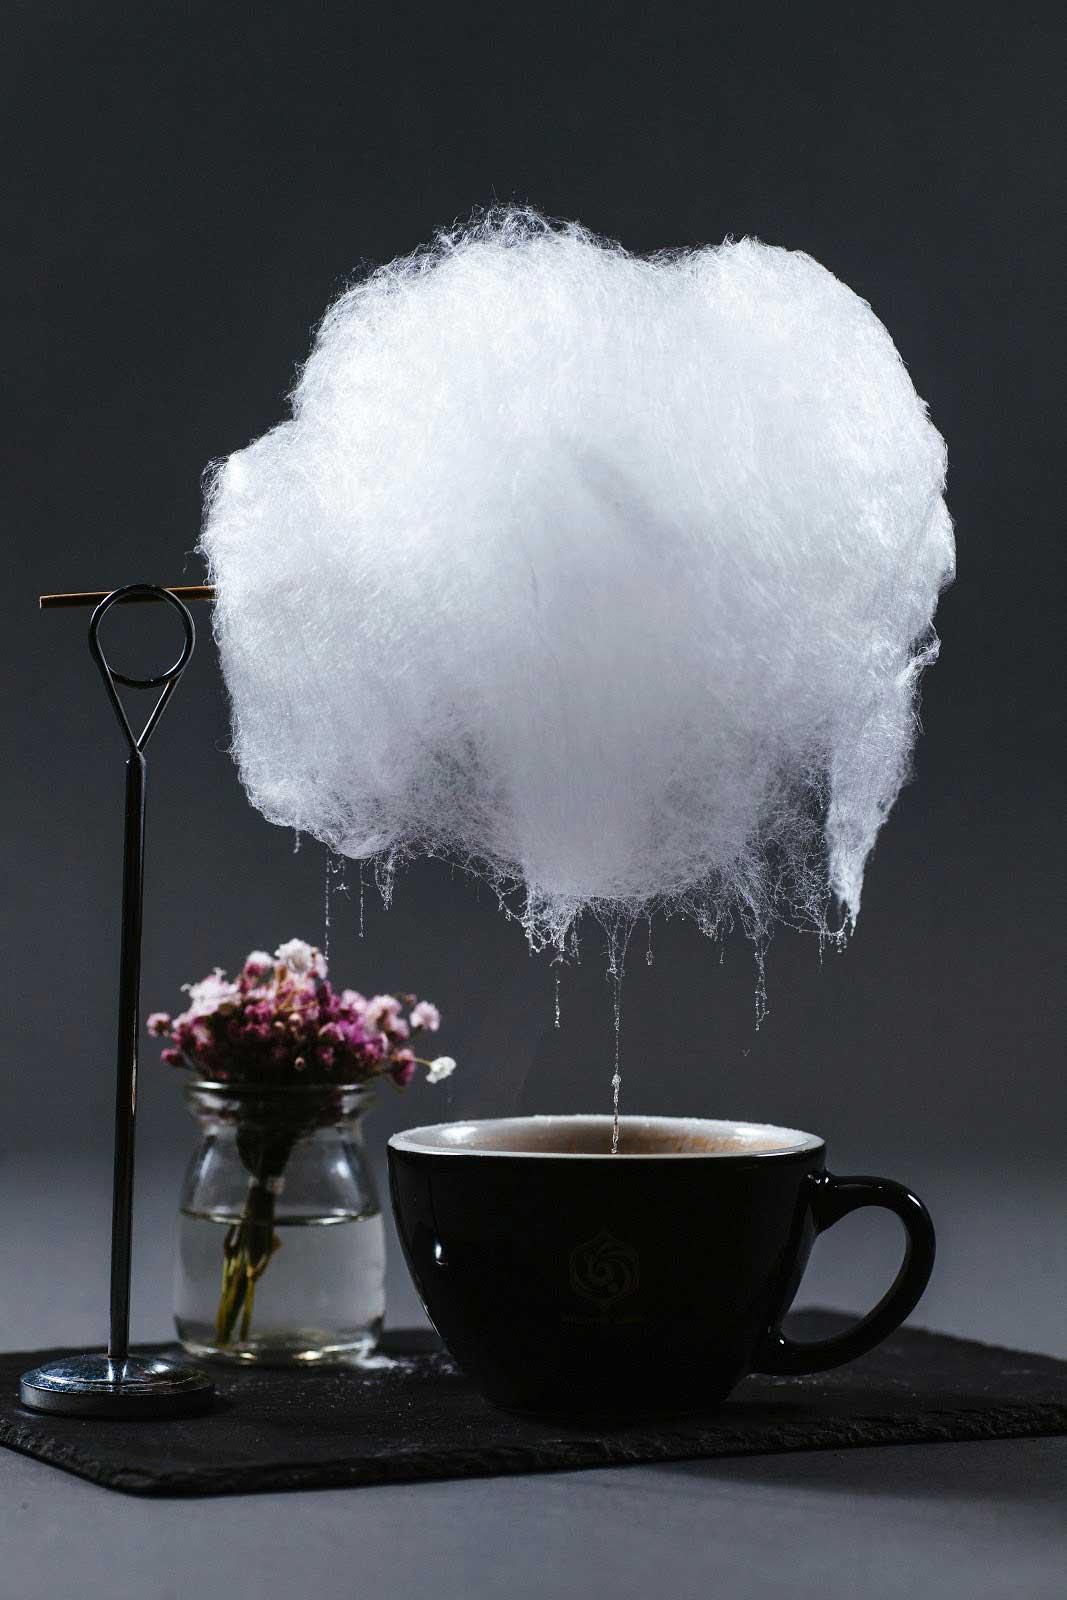 Diese Zuckerwatte-Wolke regnet in Kaffeetassen zuckerwattenwolke-kaffee_09